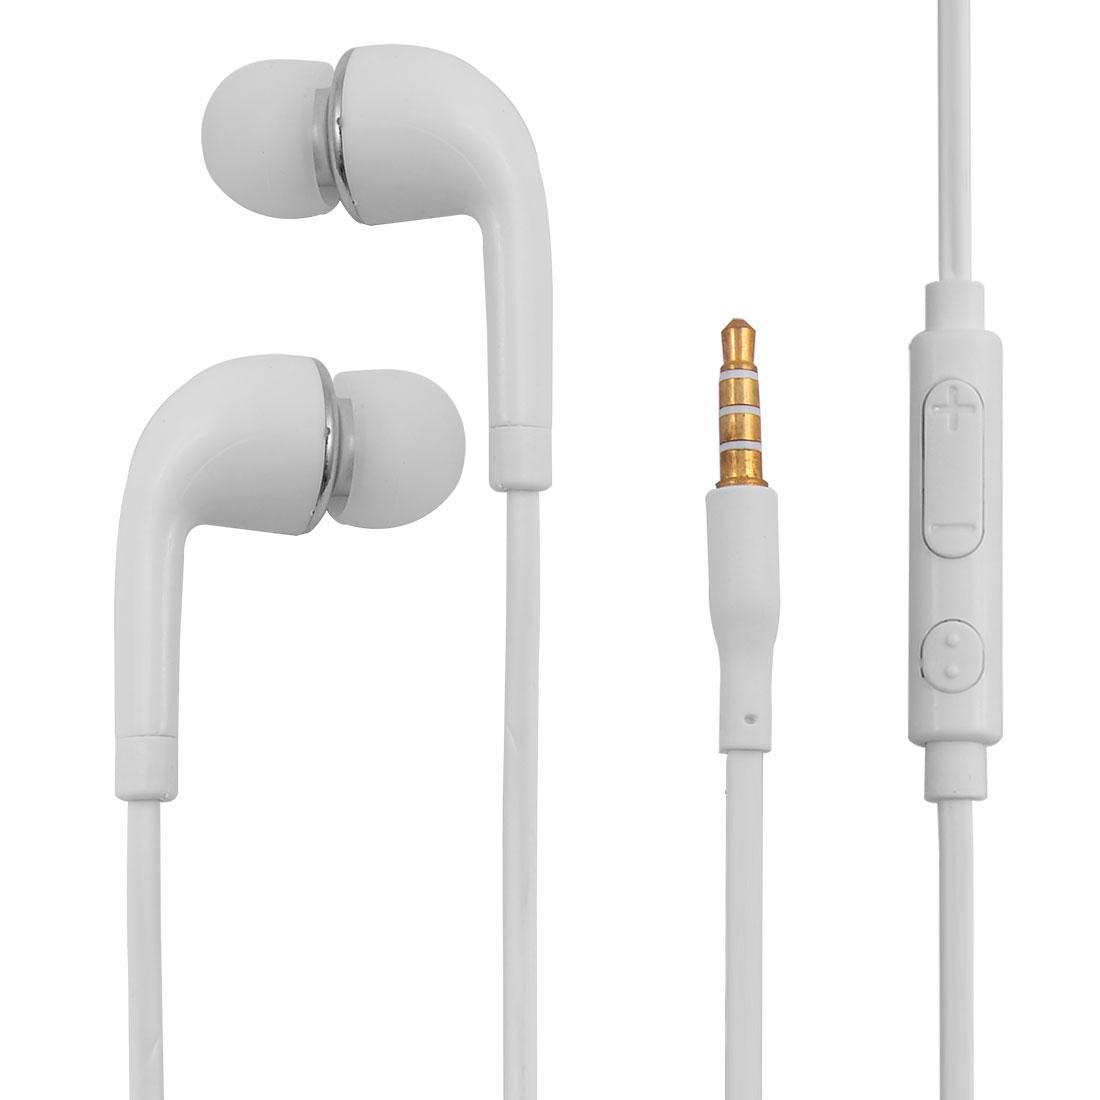 3.5mm Stereo In-Ear Earphones Headphones Earbuds White for Smartphone